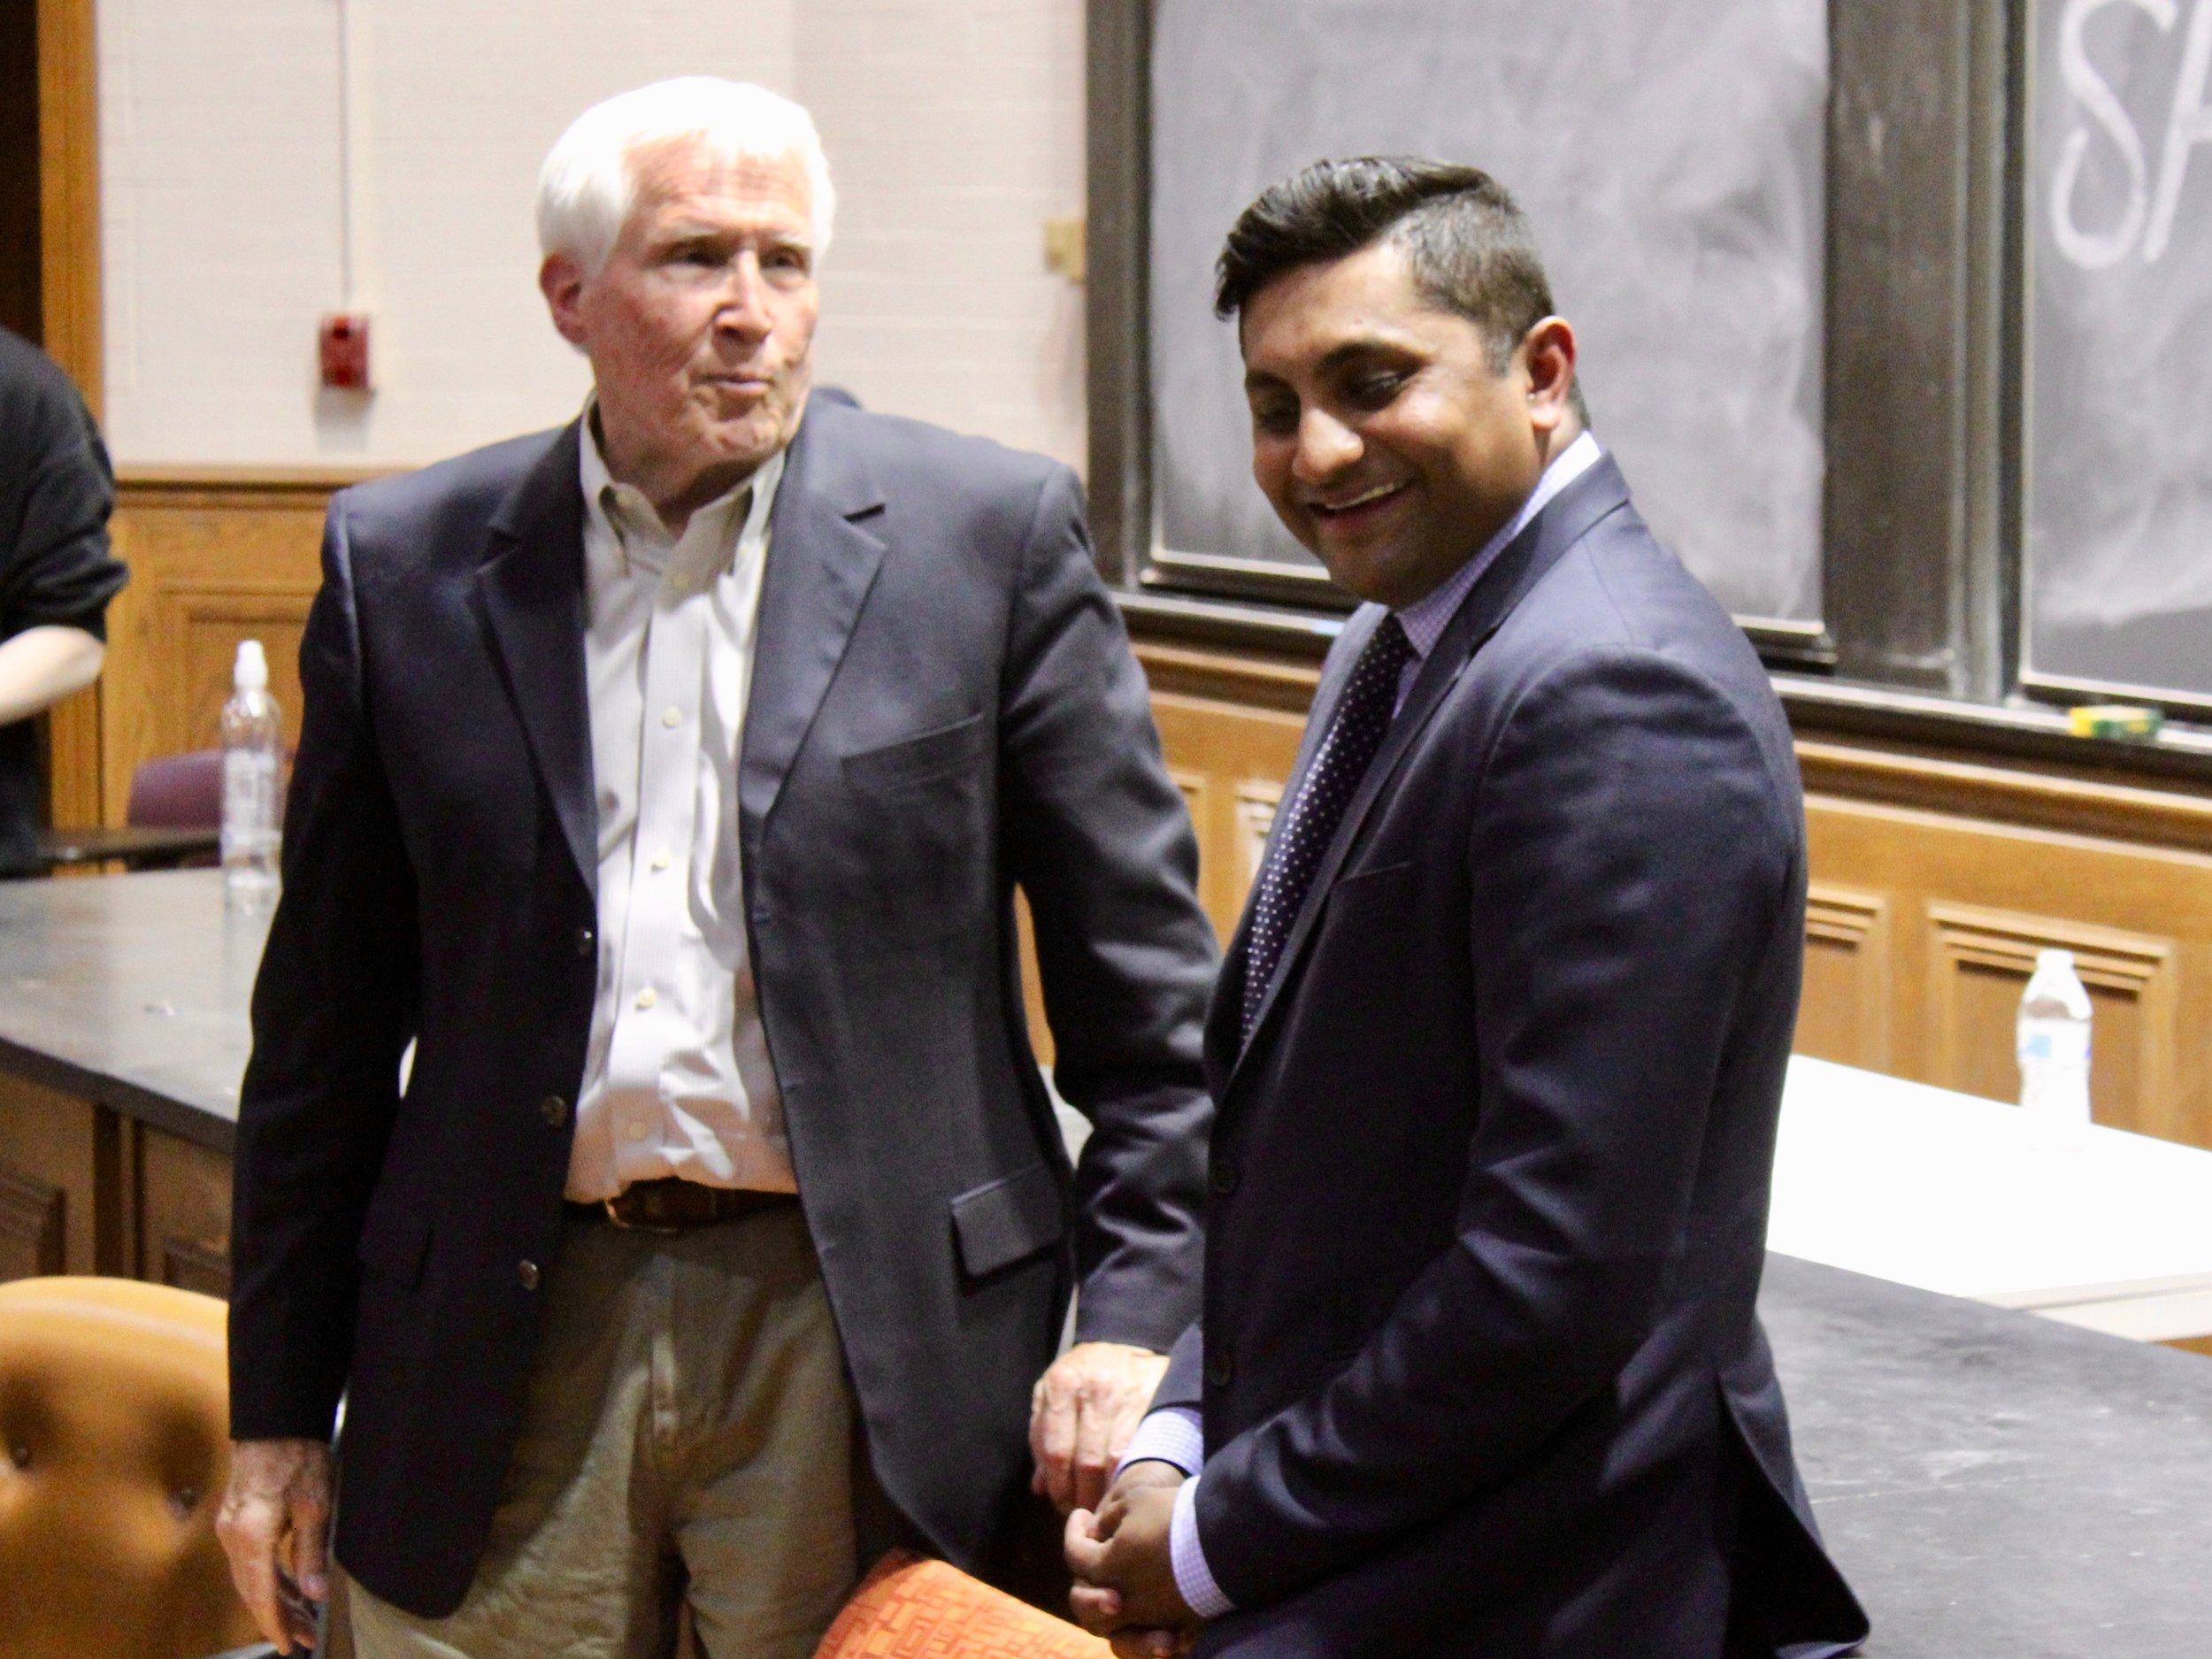 University of Chicago economist Allen Sanderson and Alderman Ameya Pawar talk after their debate in May. (One Illinois/Ted Cox)